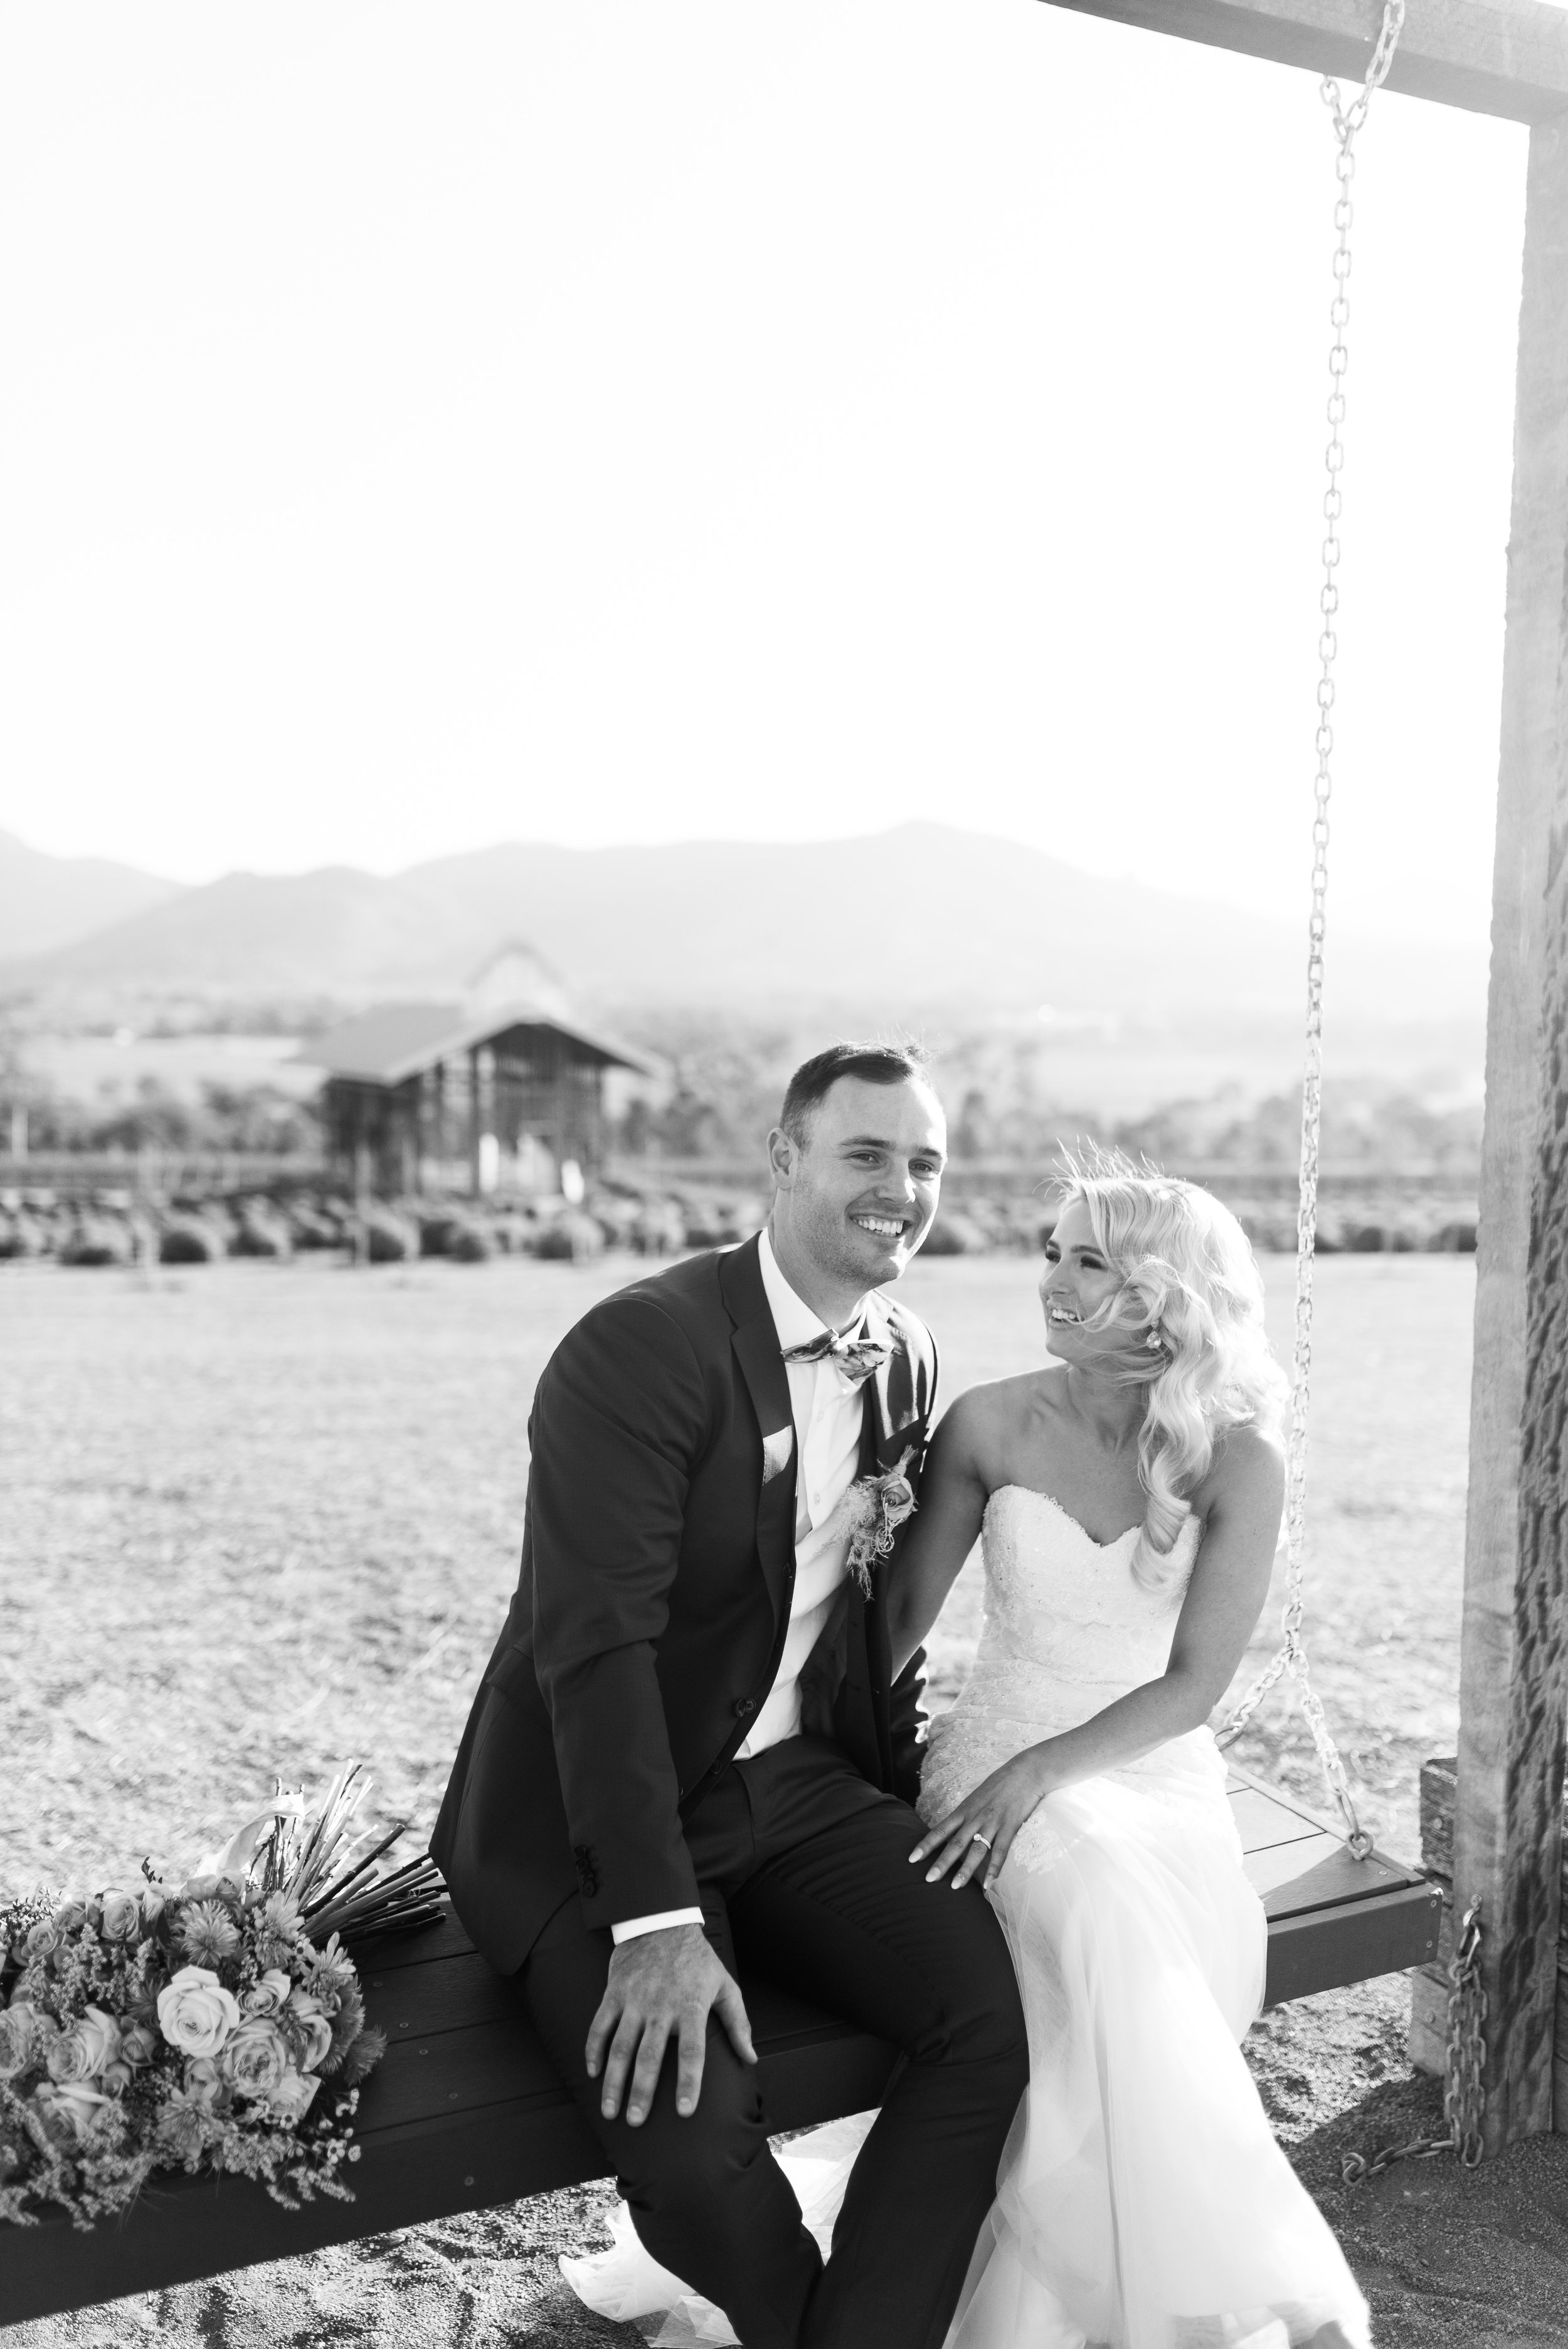 Kooroomba-Vineyard-Lavender-Farm-Wedding-Fine-Art-Lauren-Olivia-61.jpg